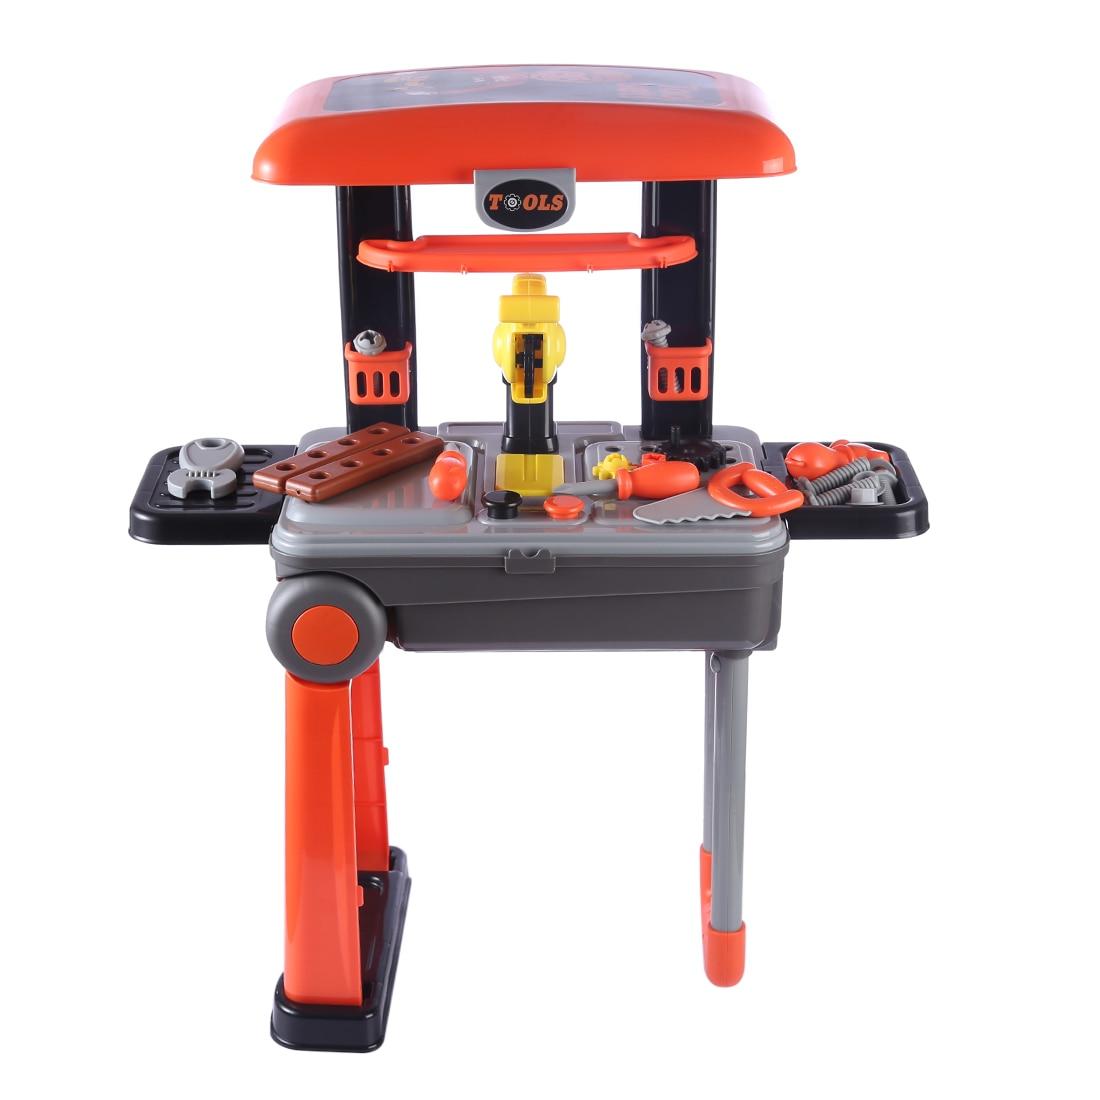 цены на Children Repair Tool Toys Set Workshop Playset Educational Toy - Orange  в интернет-магазинах